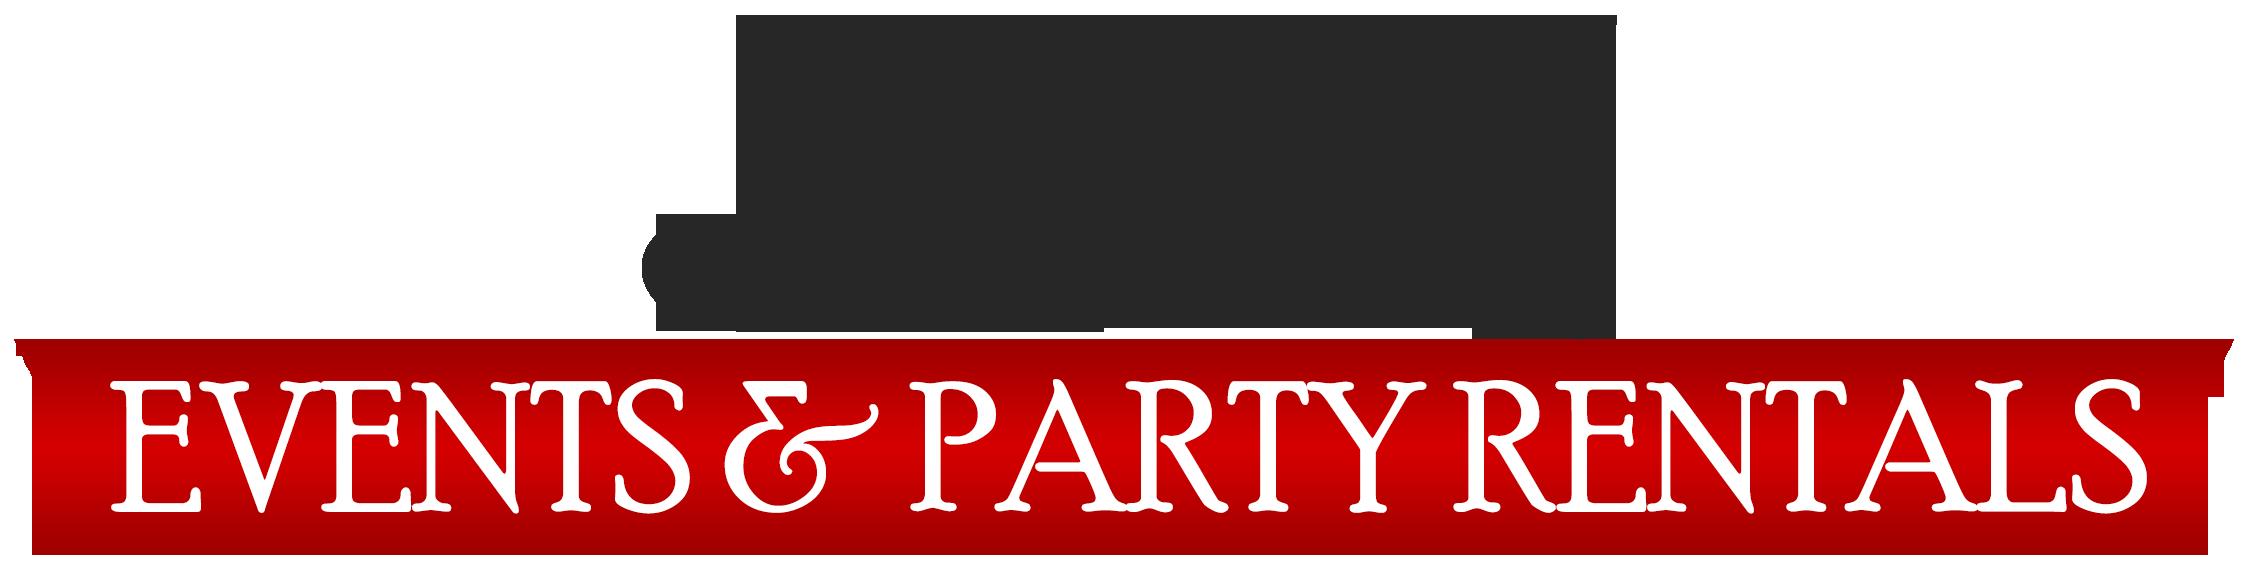 J & N Party Rentals